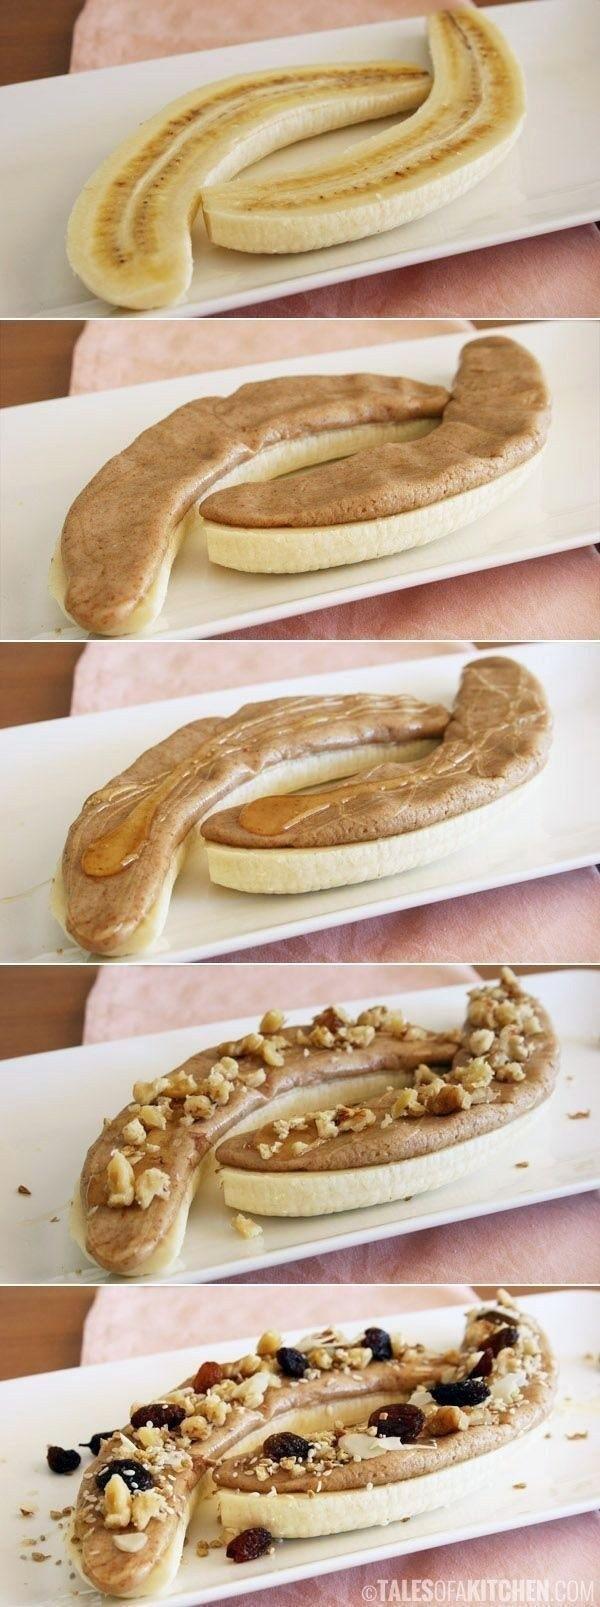 banana snacks3